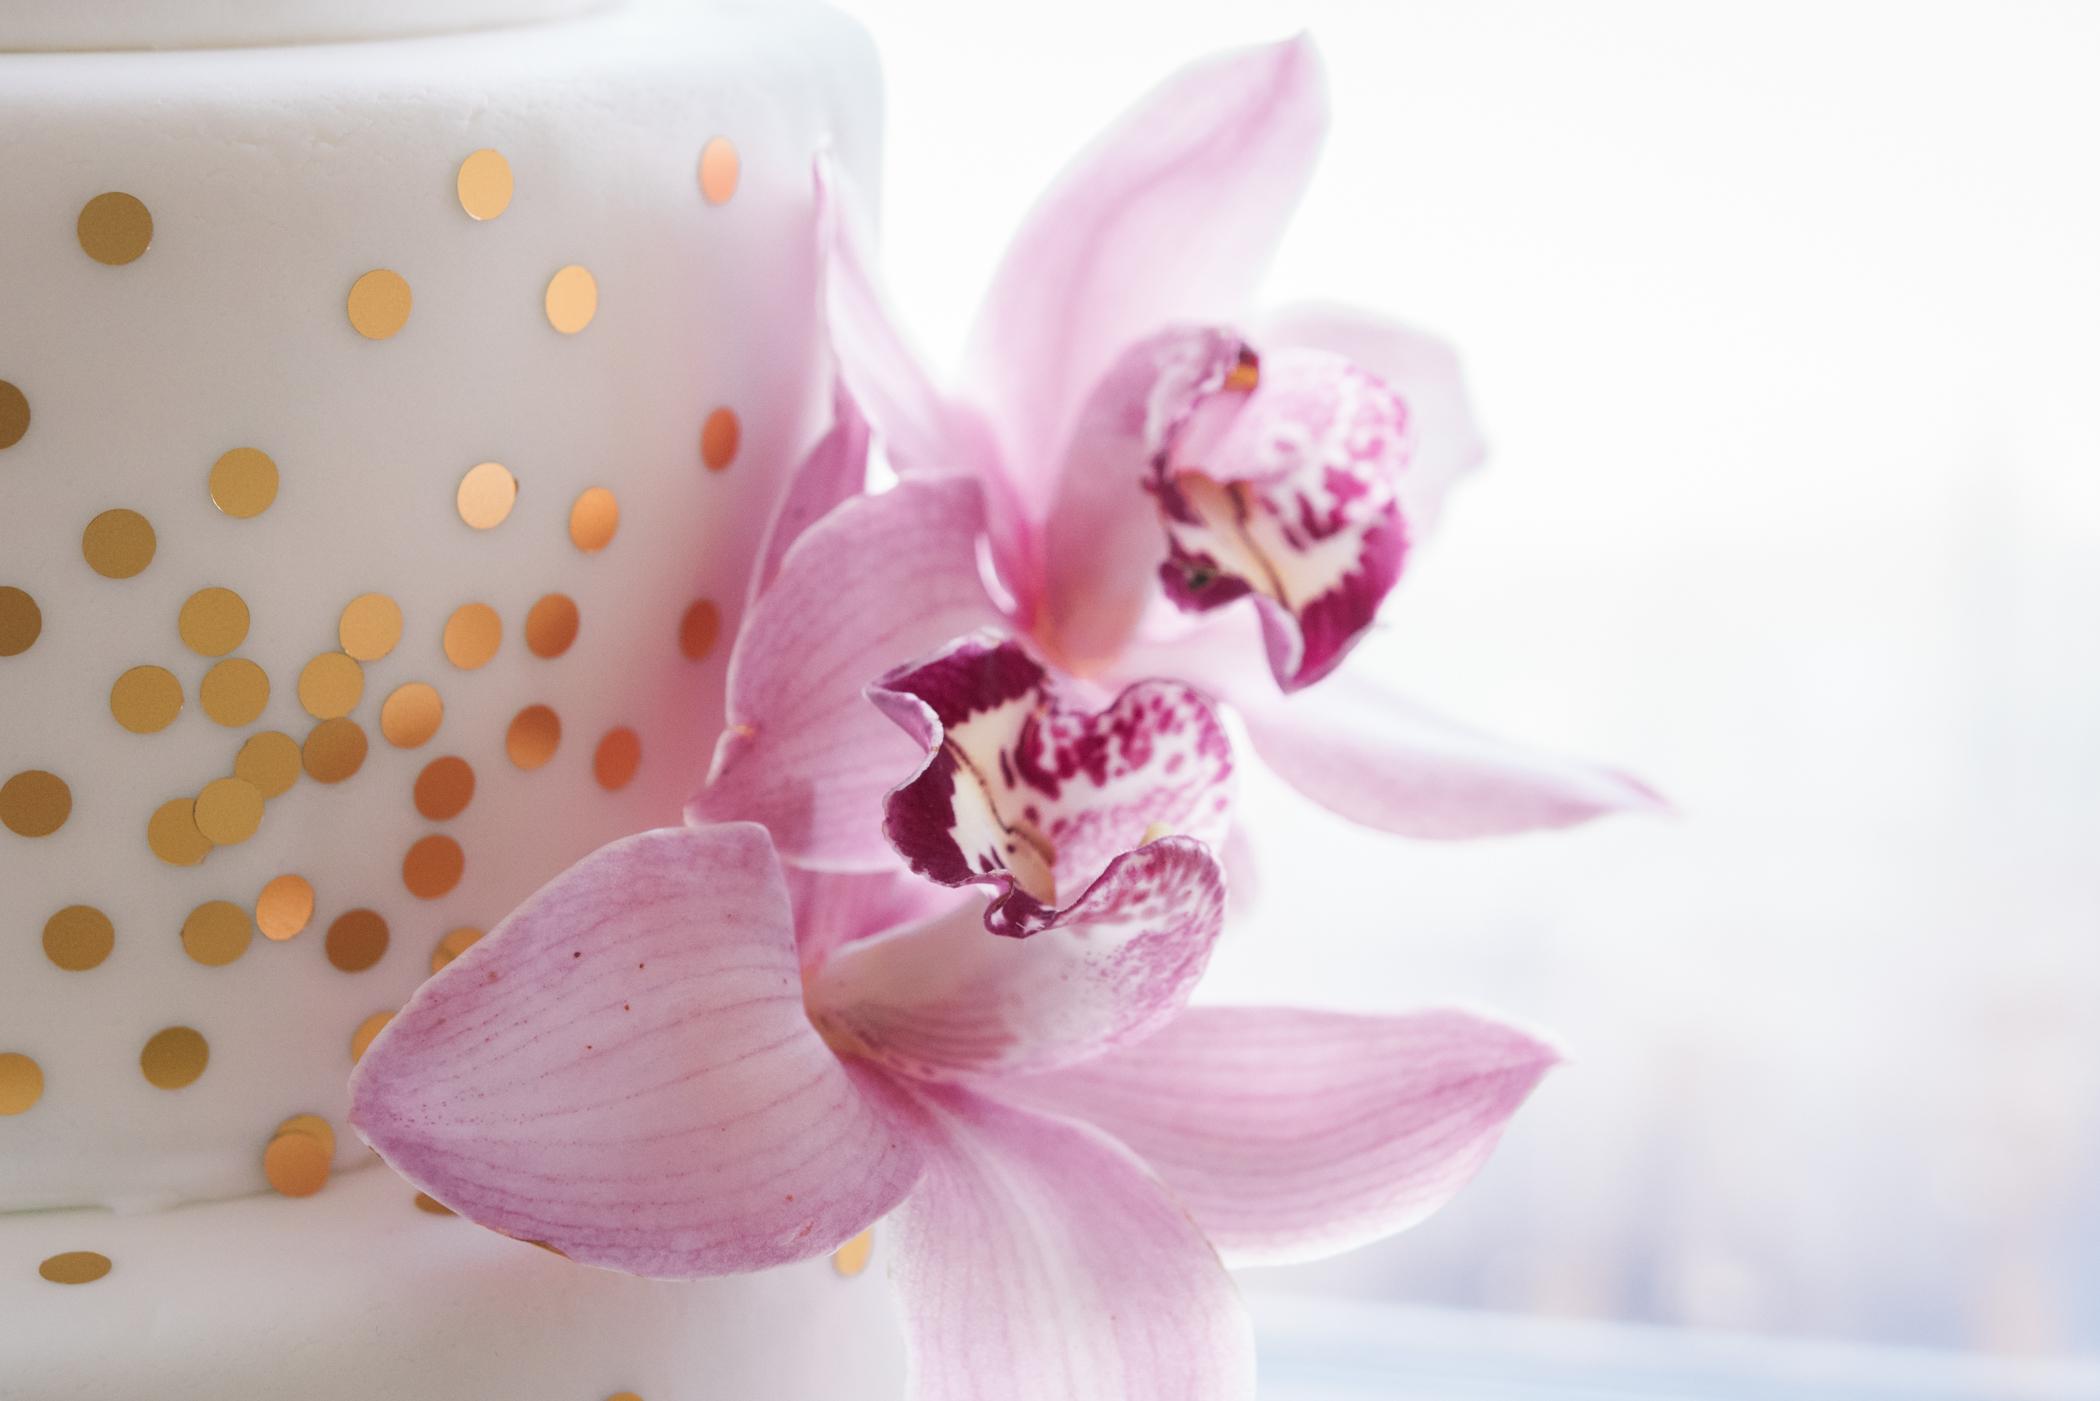 Bok-tower-gardens-wedding-day, Tampa-wedding-photographer, wedding-cake